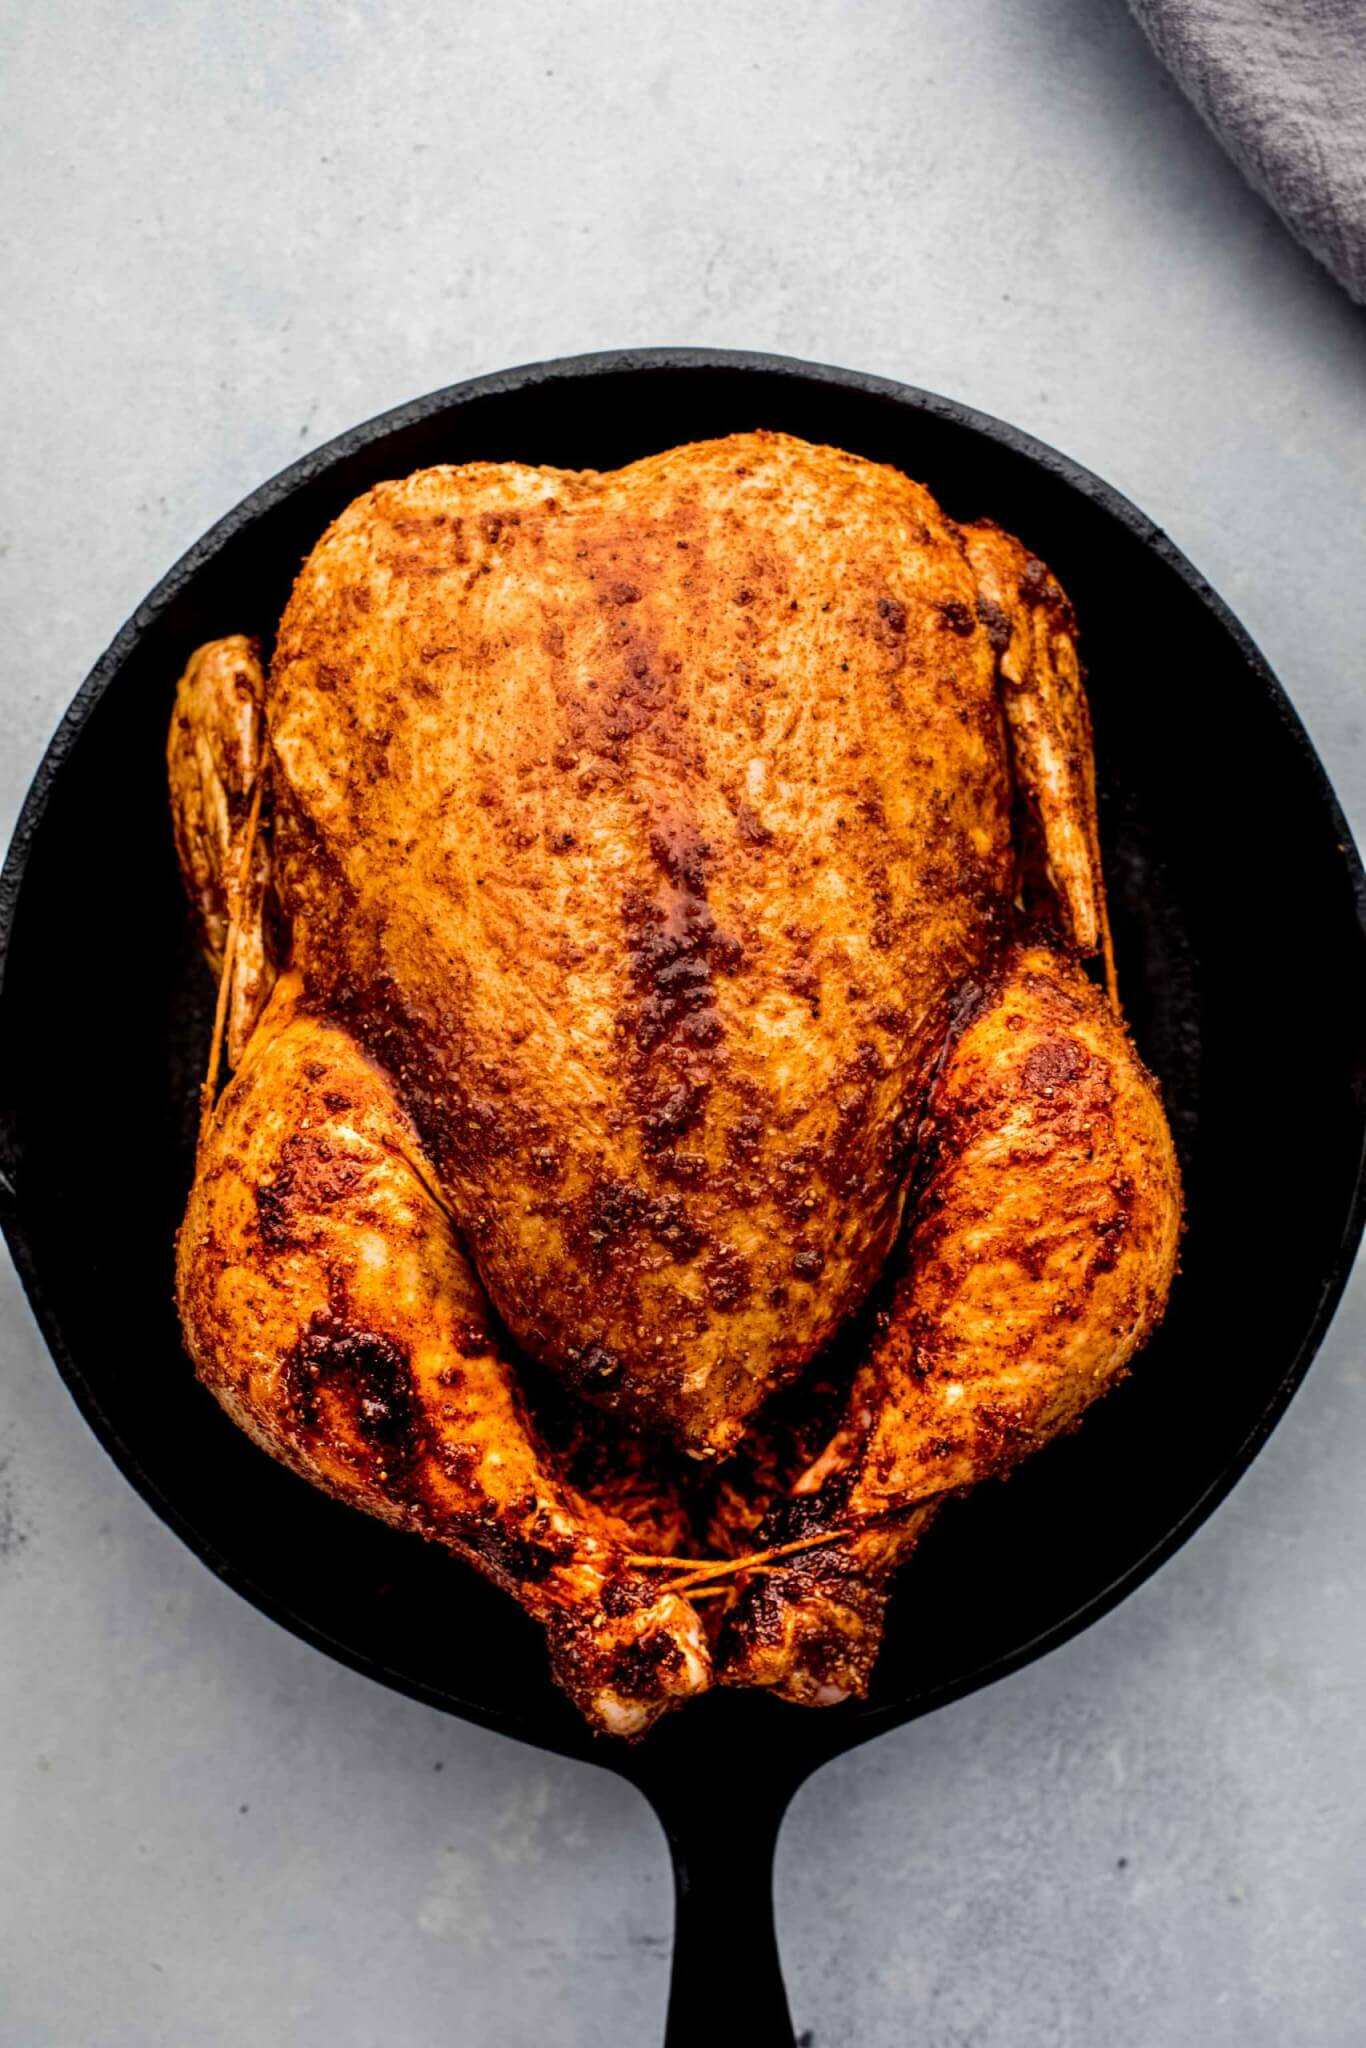 Chicken in cast iron skillet before baking.